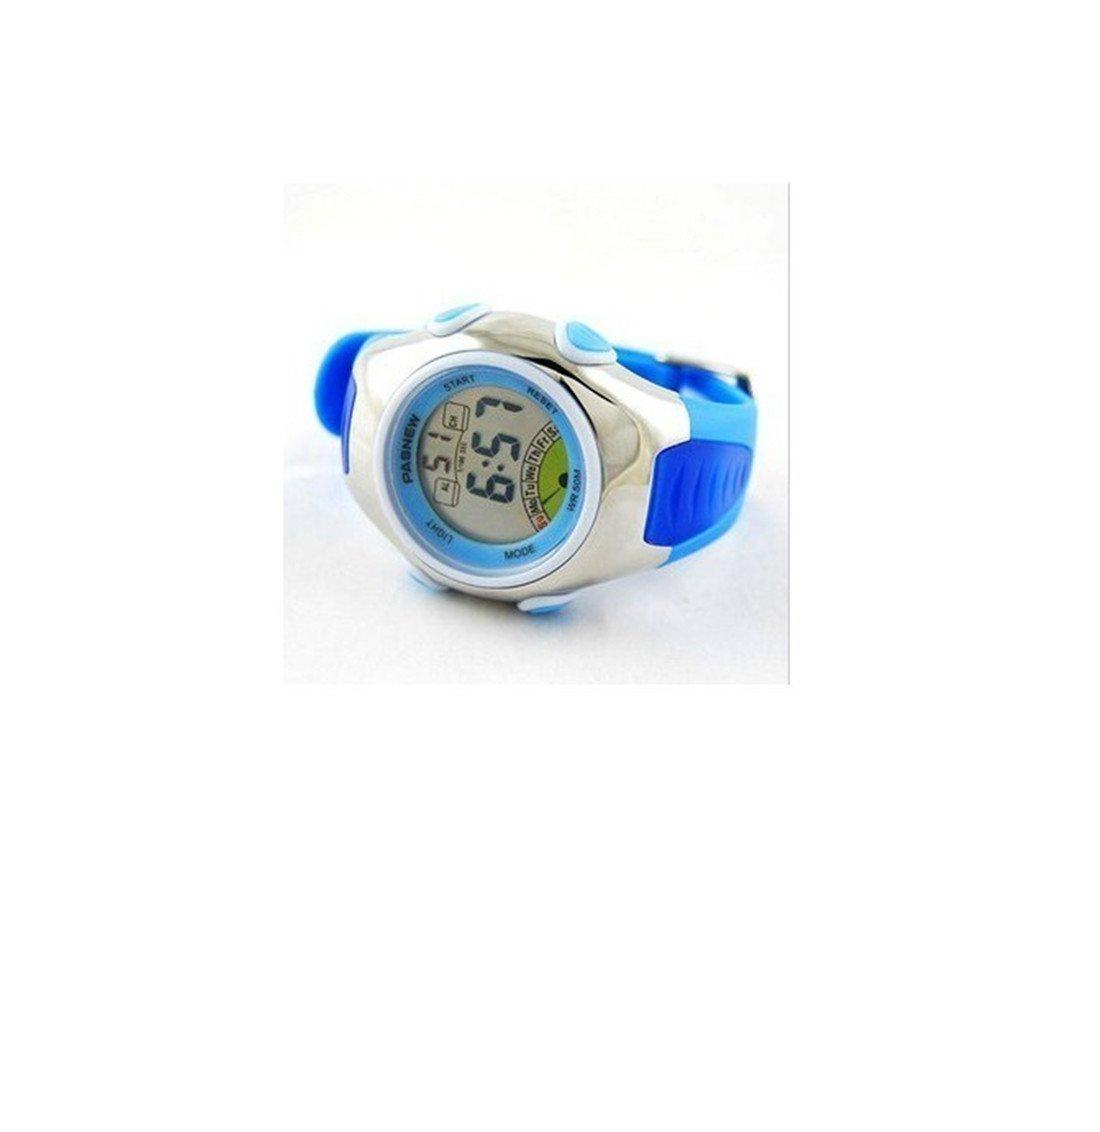 Fashion Waterproof Children Boys Girls LCD Digital Sport Watch with Alarm, Chronograph, Date (Blue) by OJIA